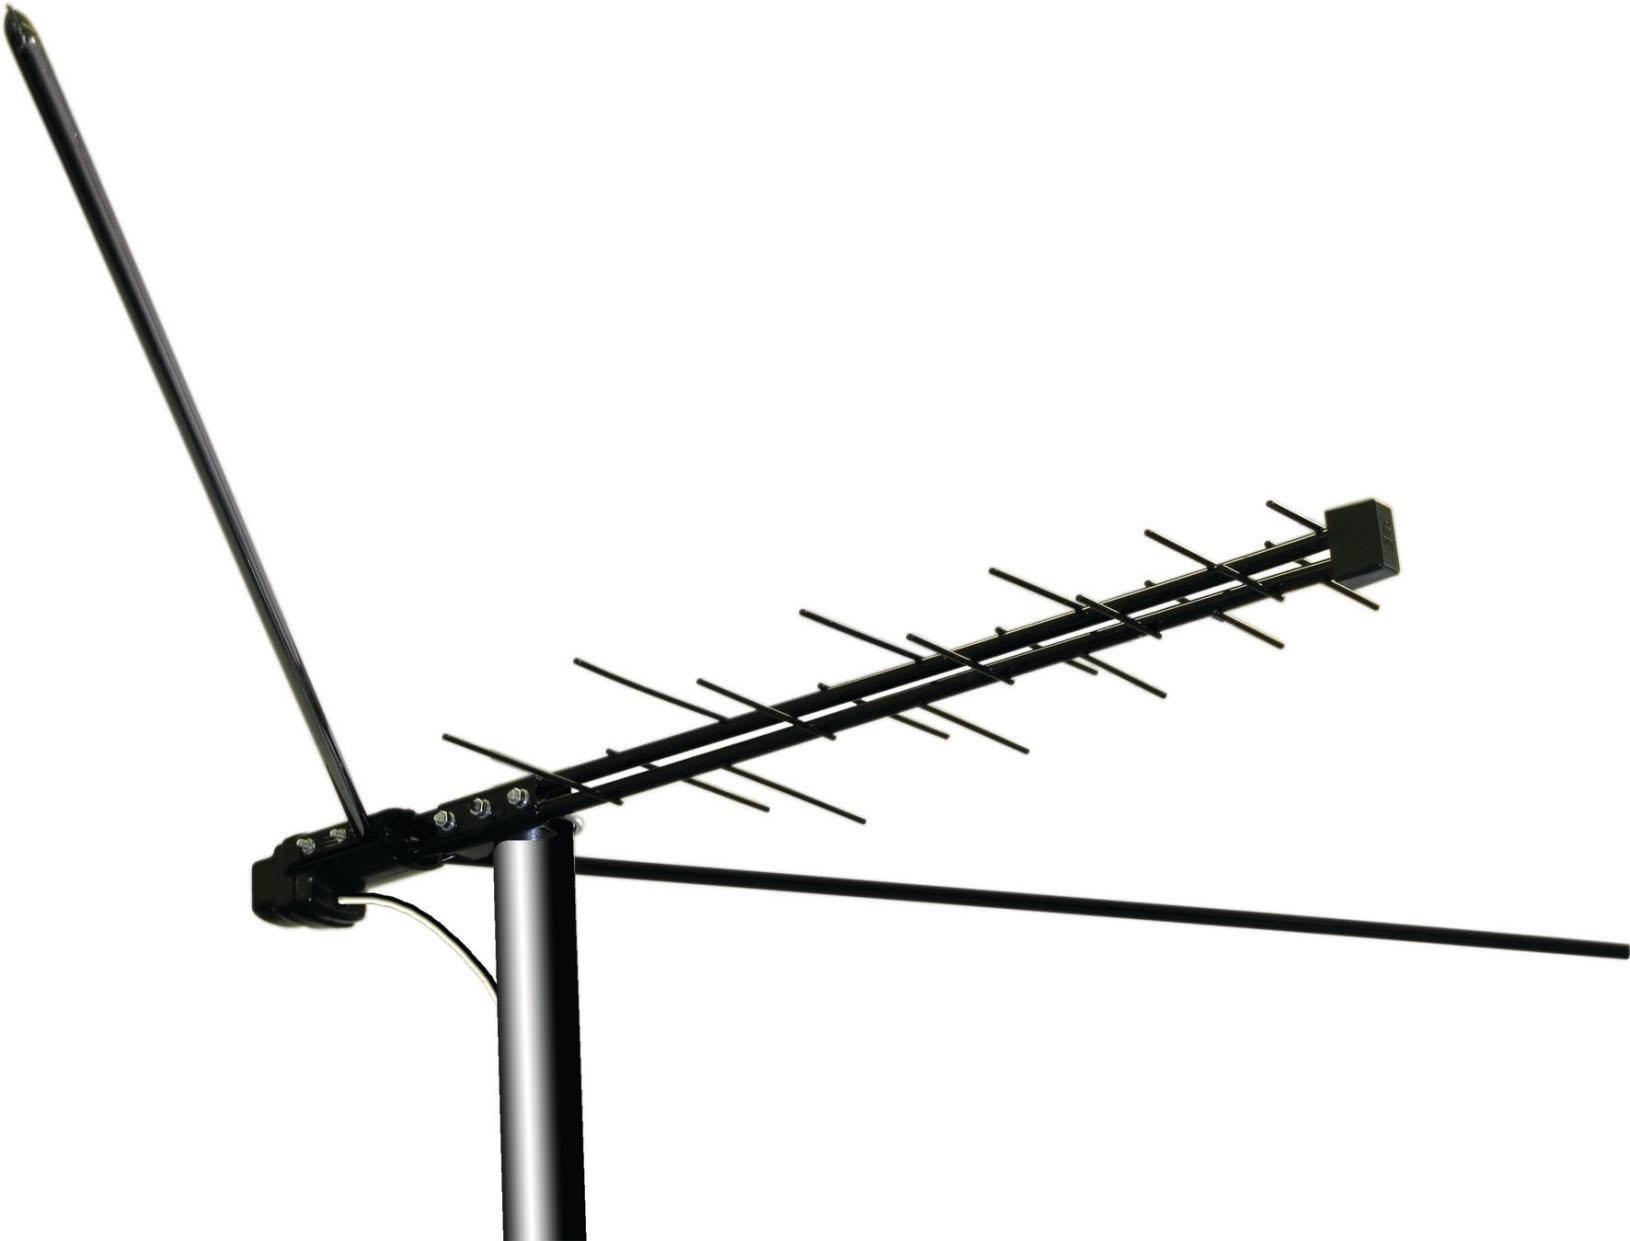 Схемы телевизионных уличных антенн